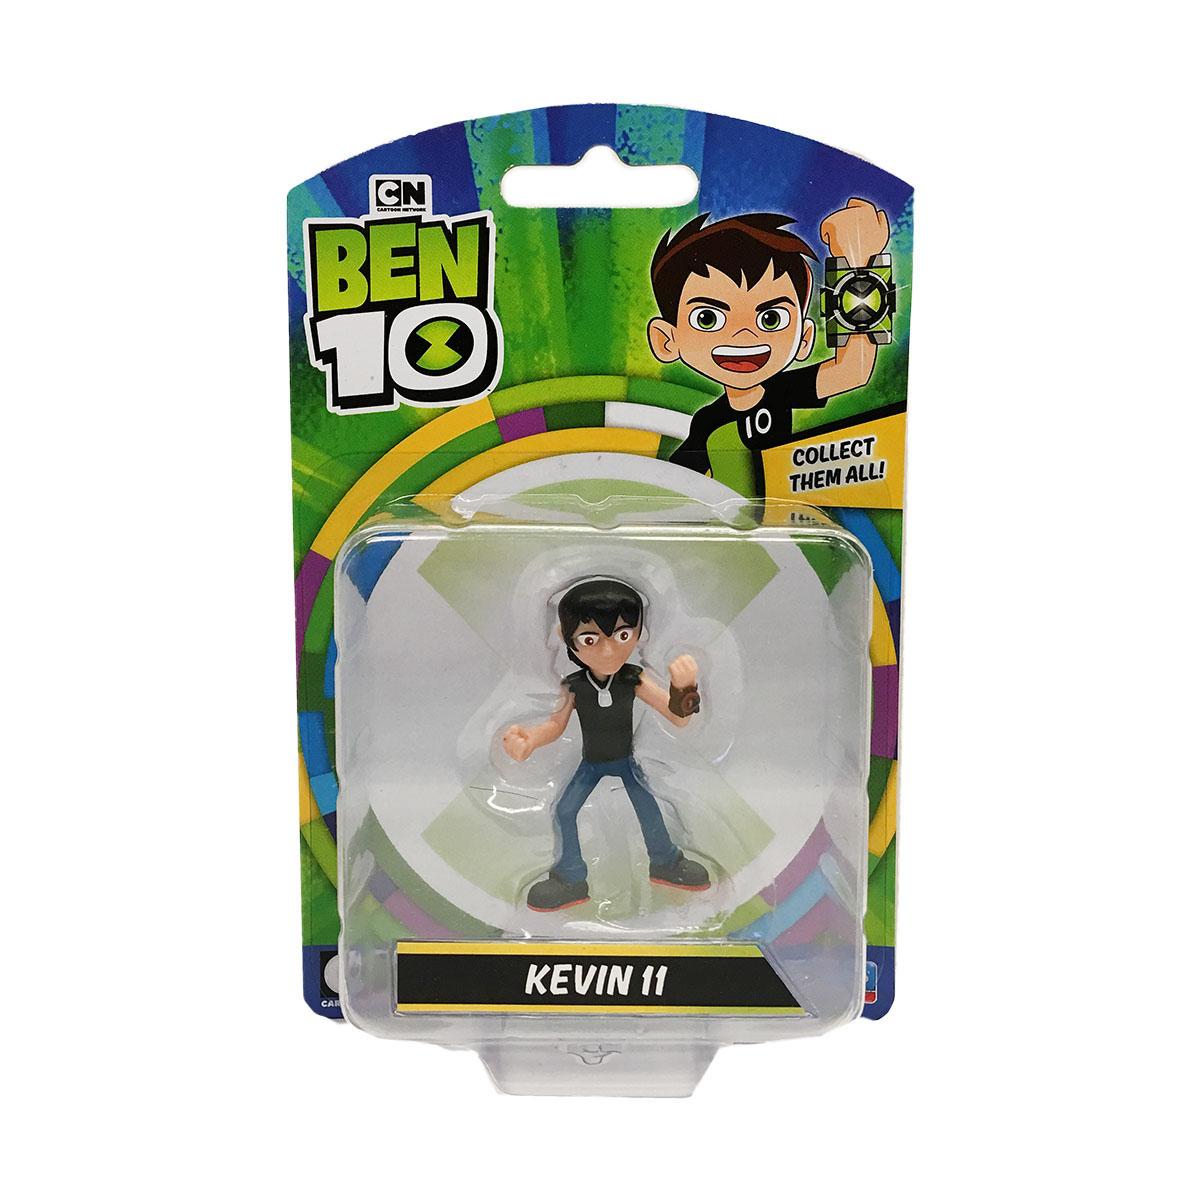 Minifigurina Ben 10, Kevin 11, 76775